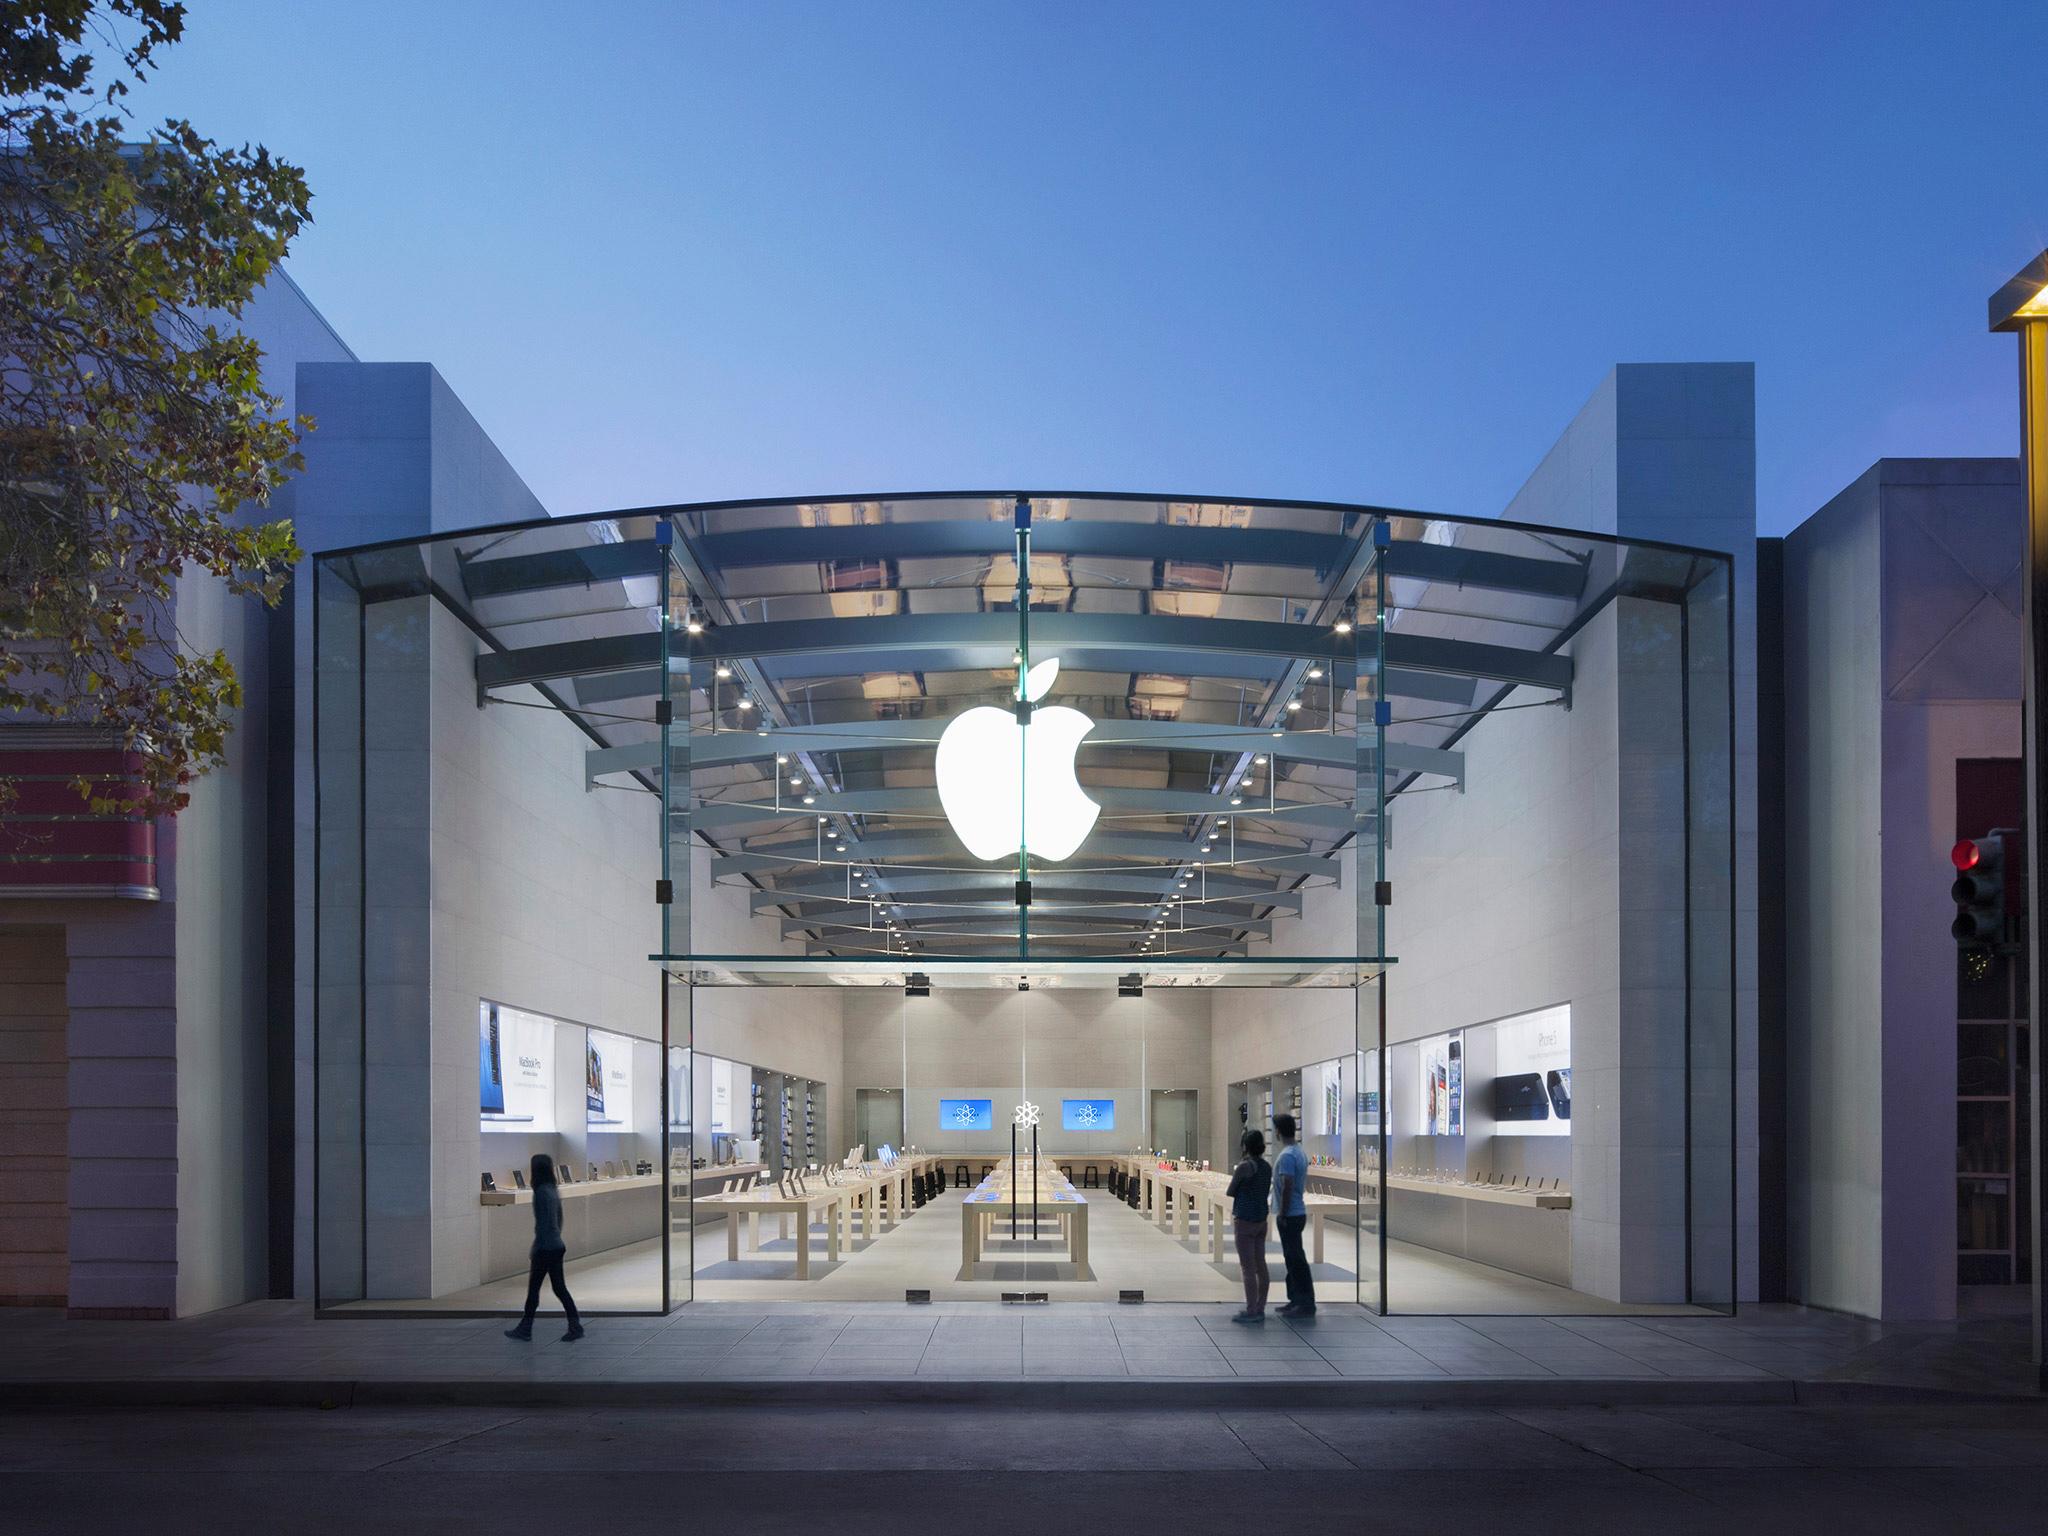 Apple palo alto at 340 university avenue palo alto ca on for Park avenue motors mercedes benz palo alto